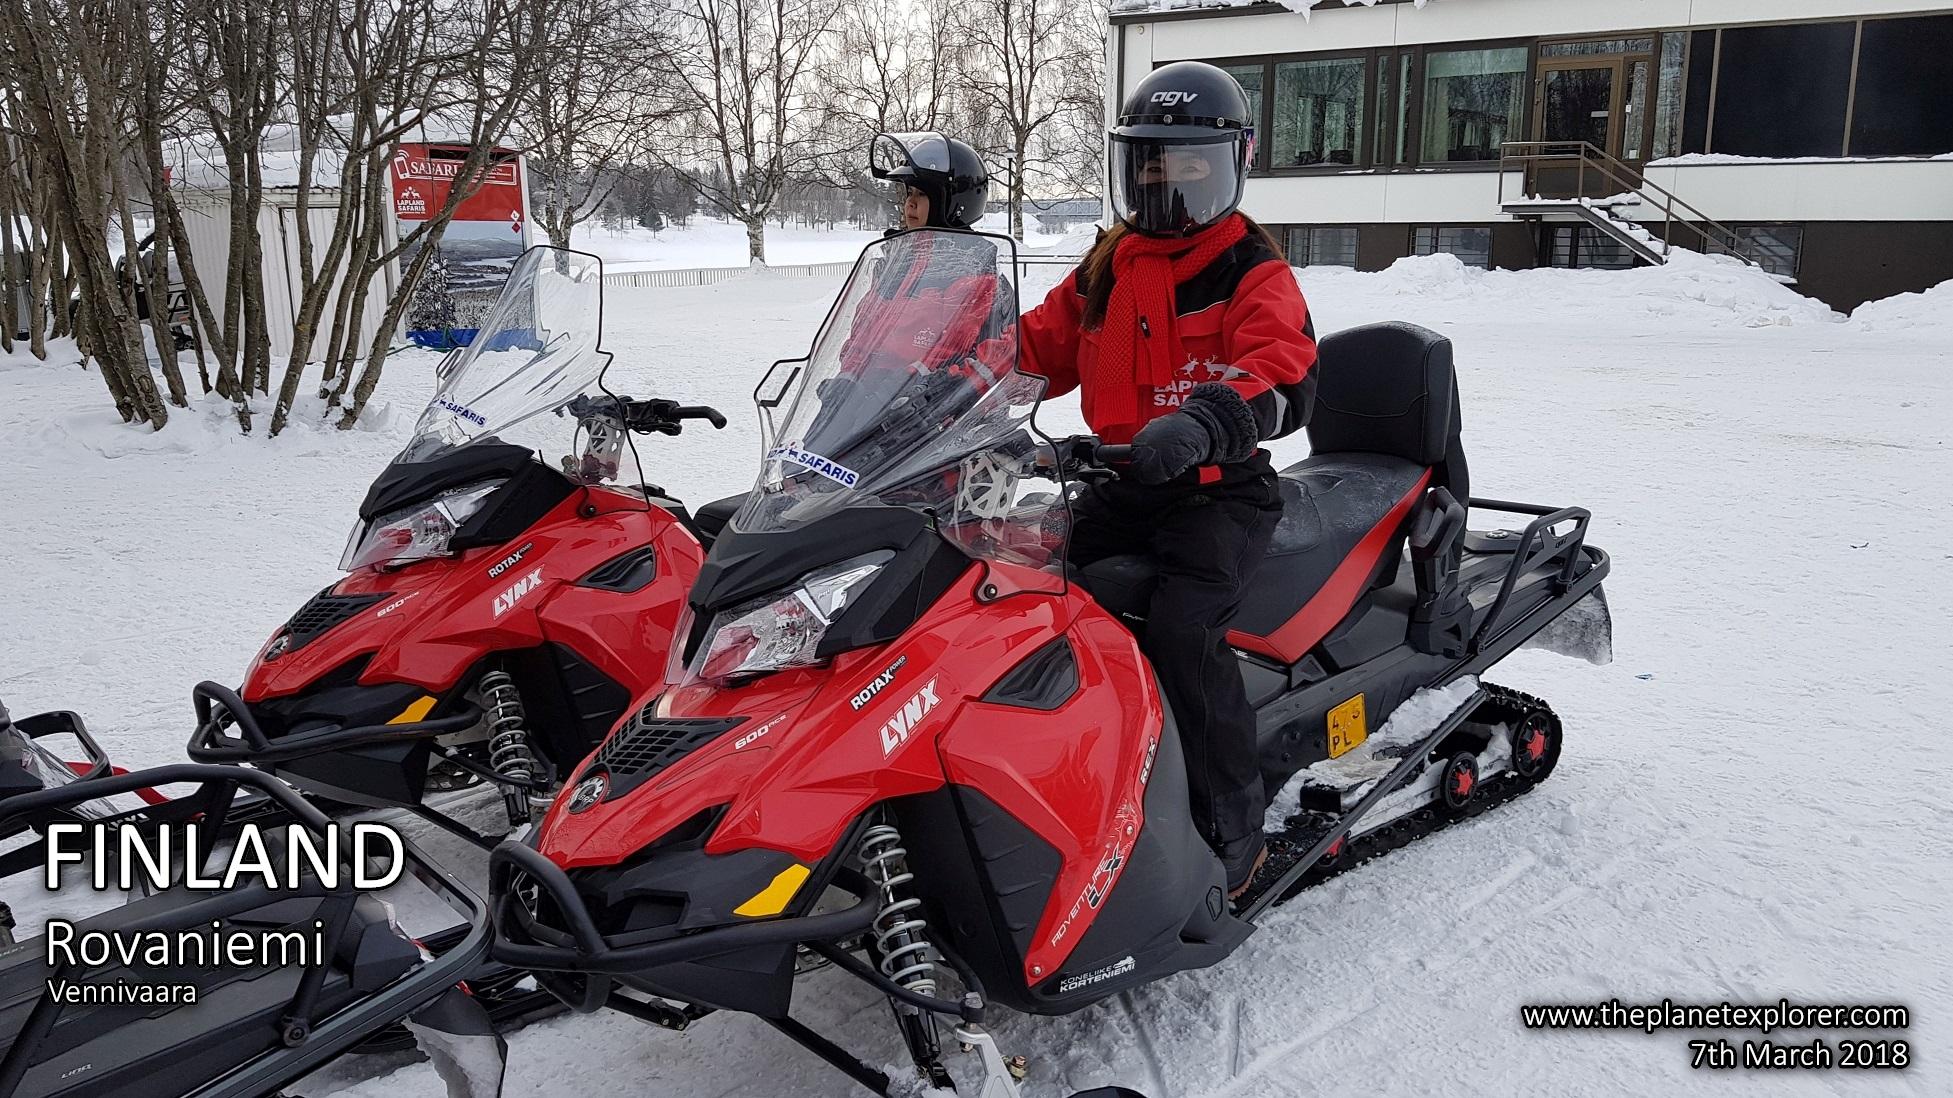 20180307_1118_Finland_Rovaniemi_Vennivaara_Snowmobile_Joanna_Samsung Note 8_LR_@www